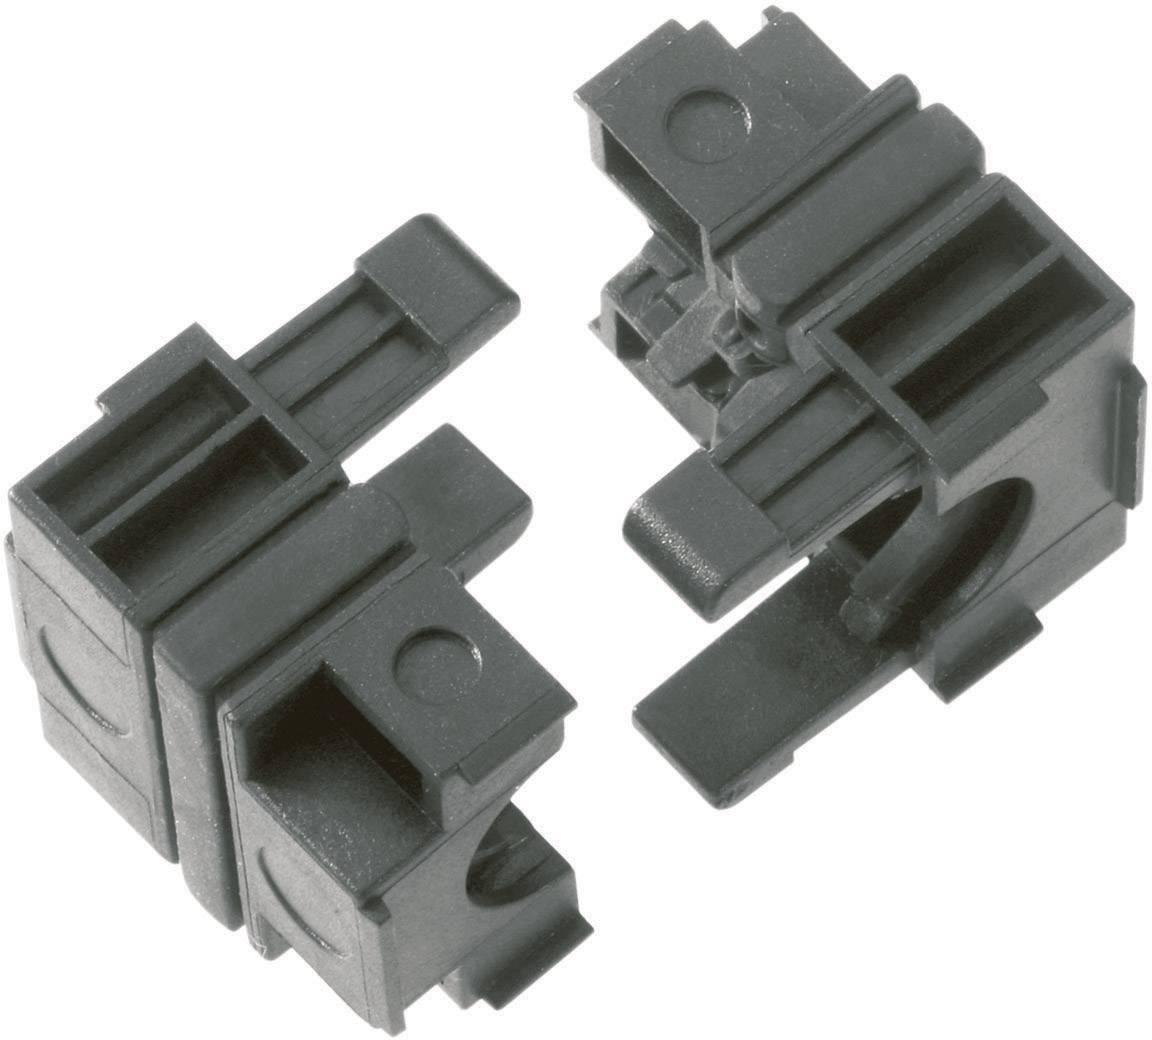 LappKabel Vtični tesnilni modul SKINTOP CUBE MODULE 5-delni komplet, 40X40L